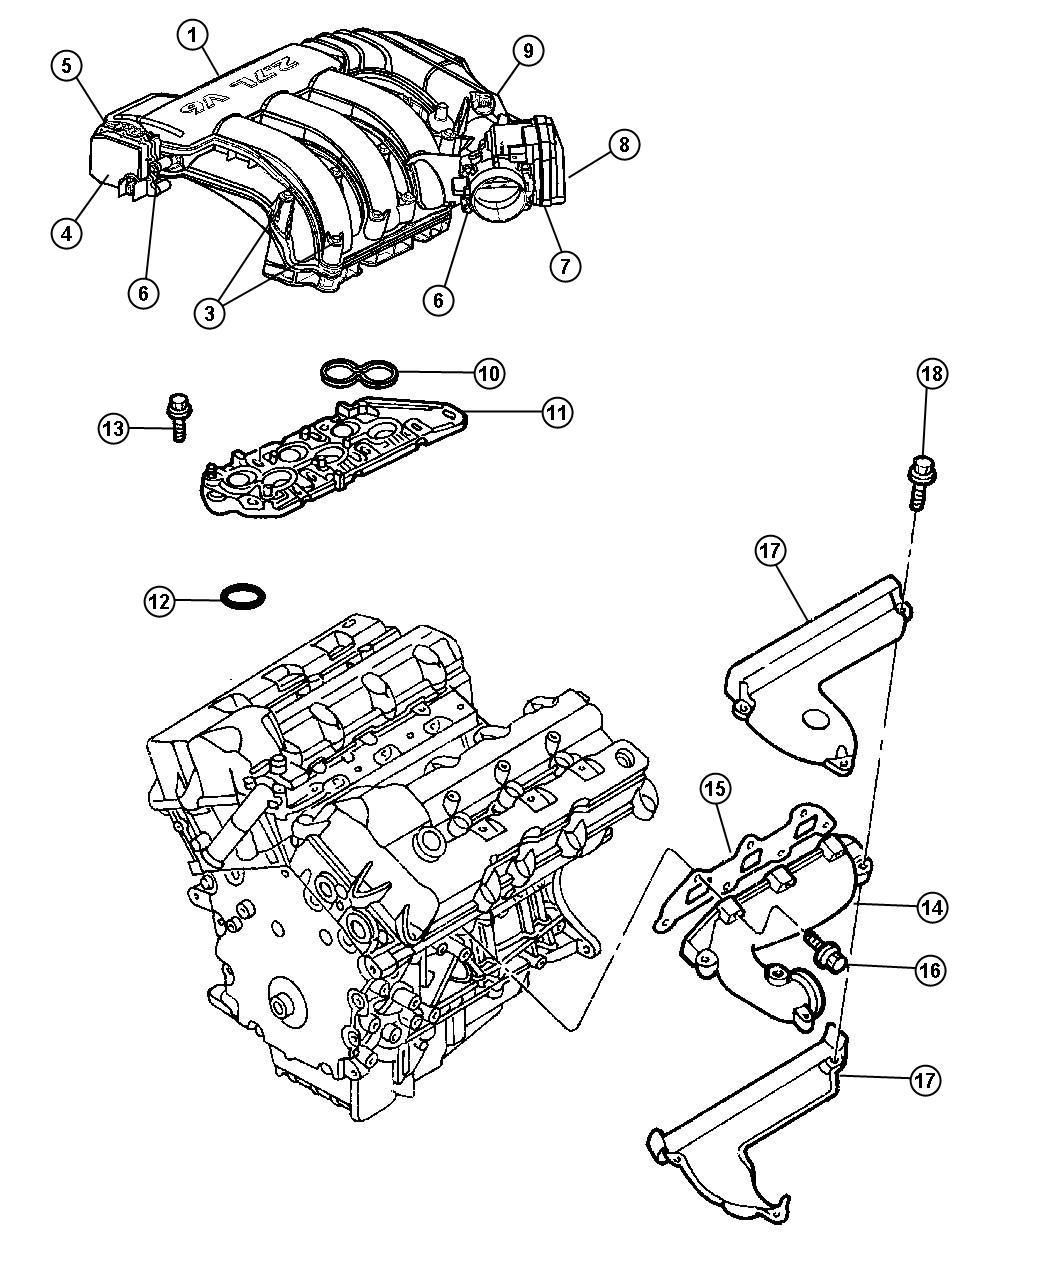 2006 Dodge Charger Plenum. Intake manifold. Engine